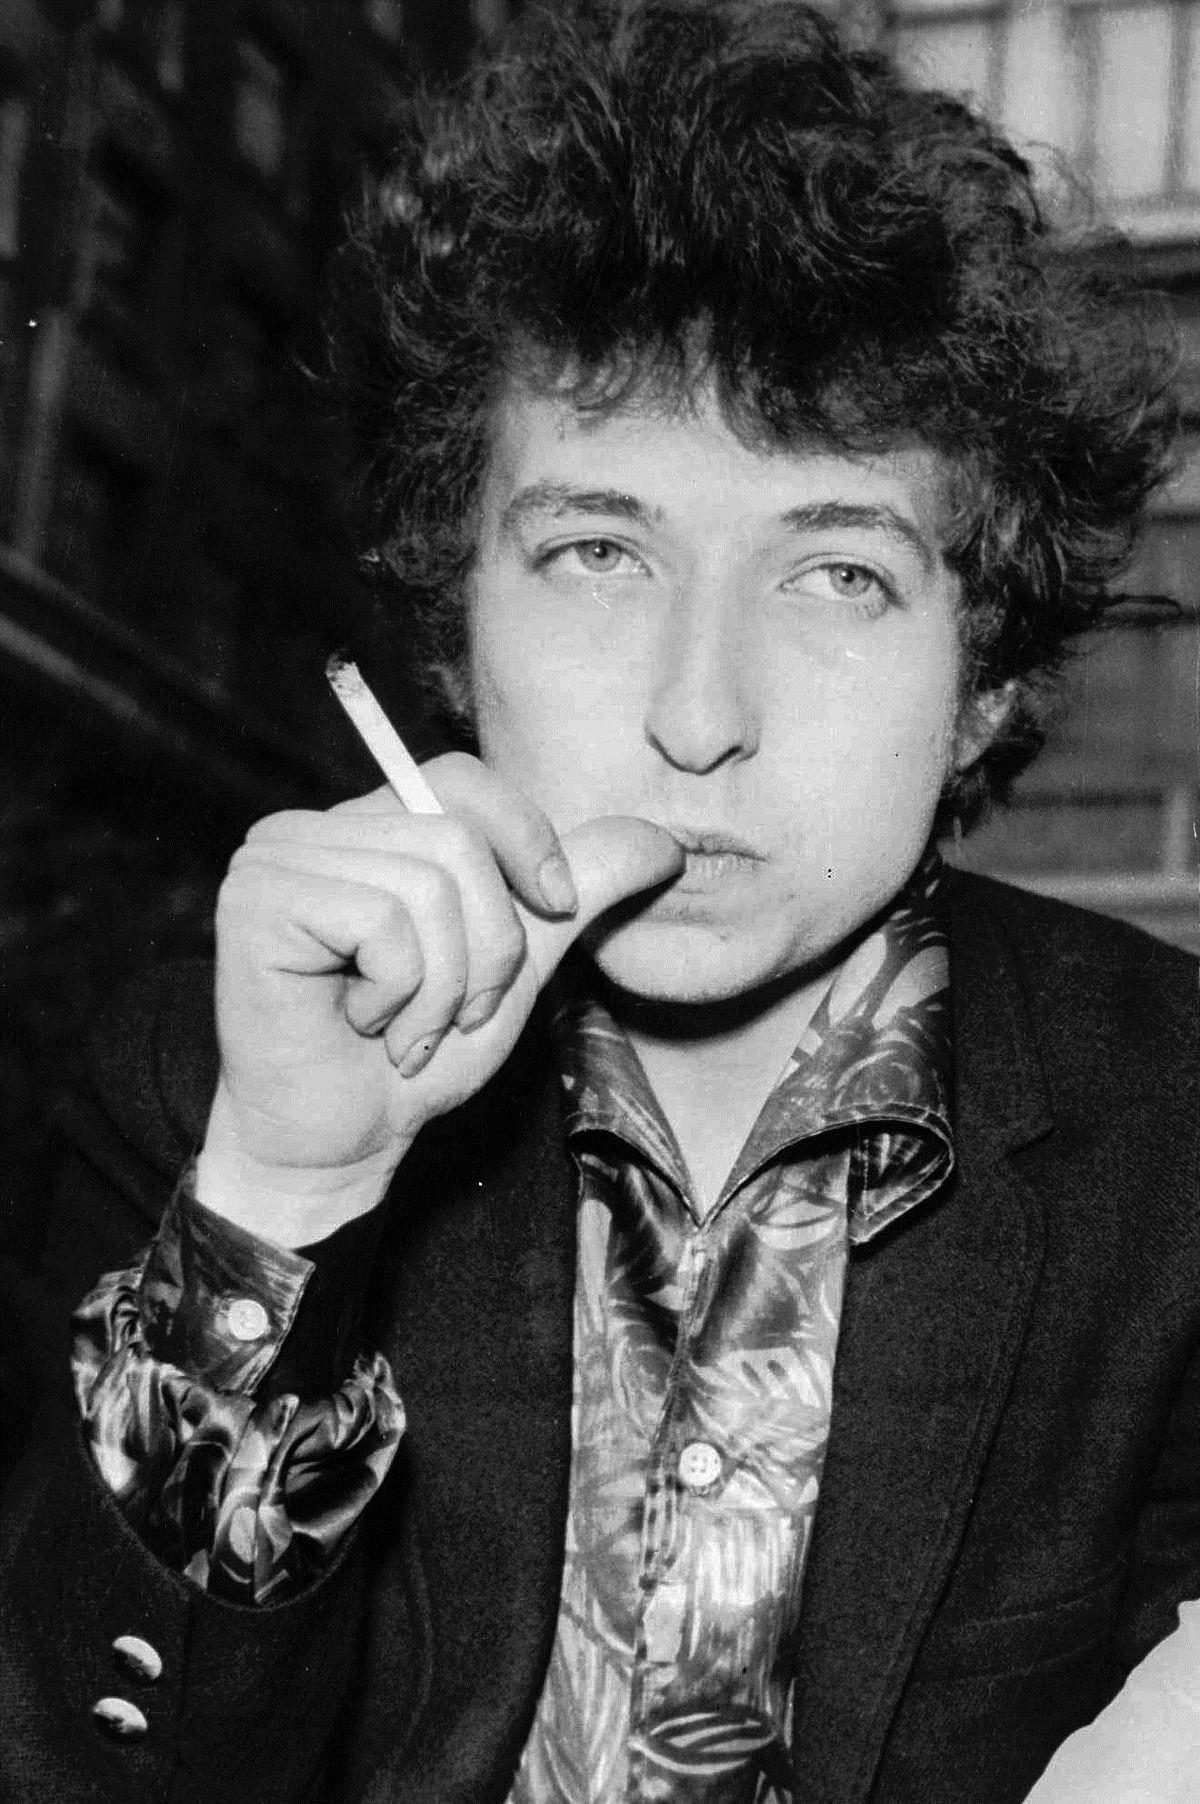 Bob Dylan in London, 1965. (Photo: AP)